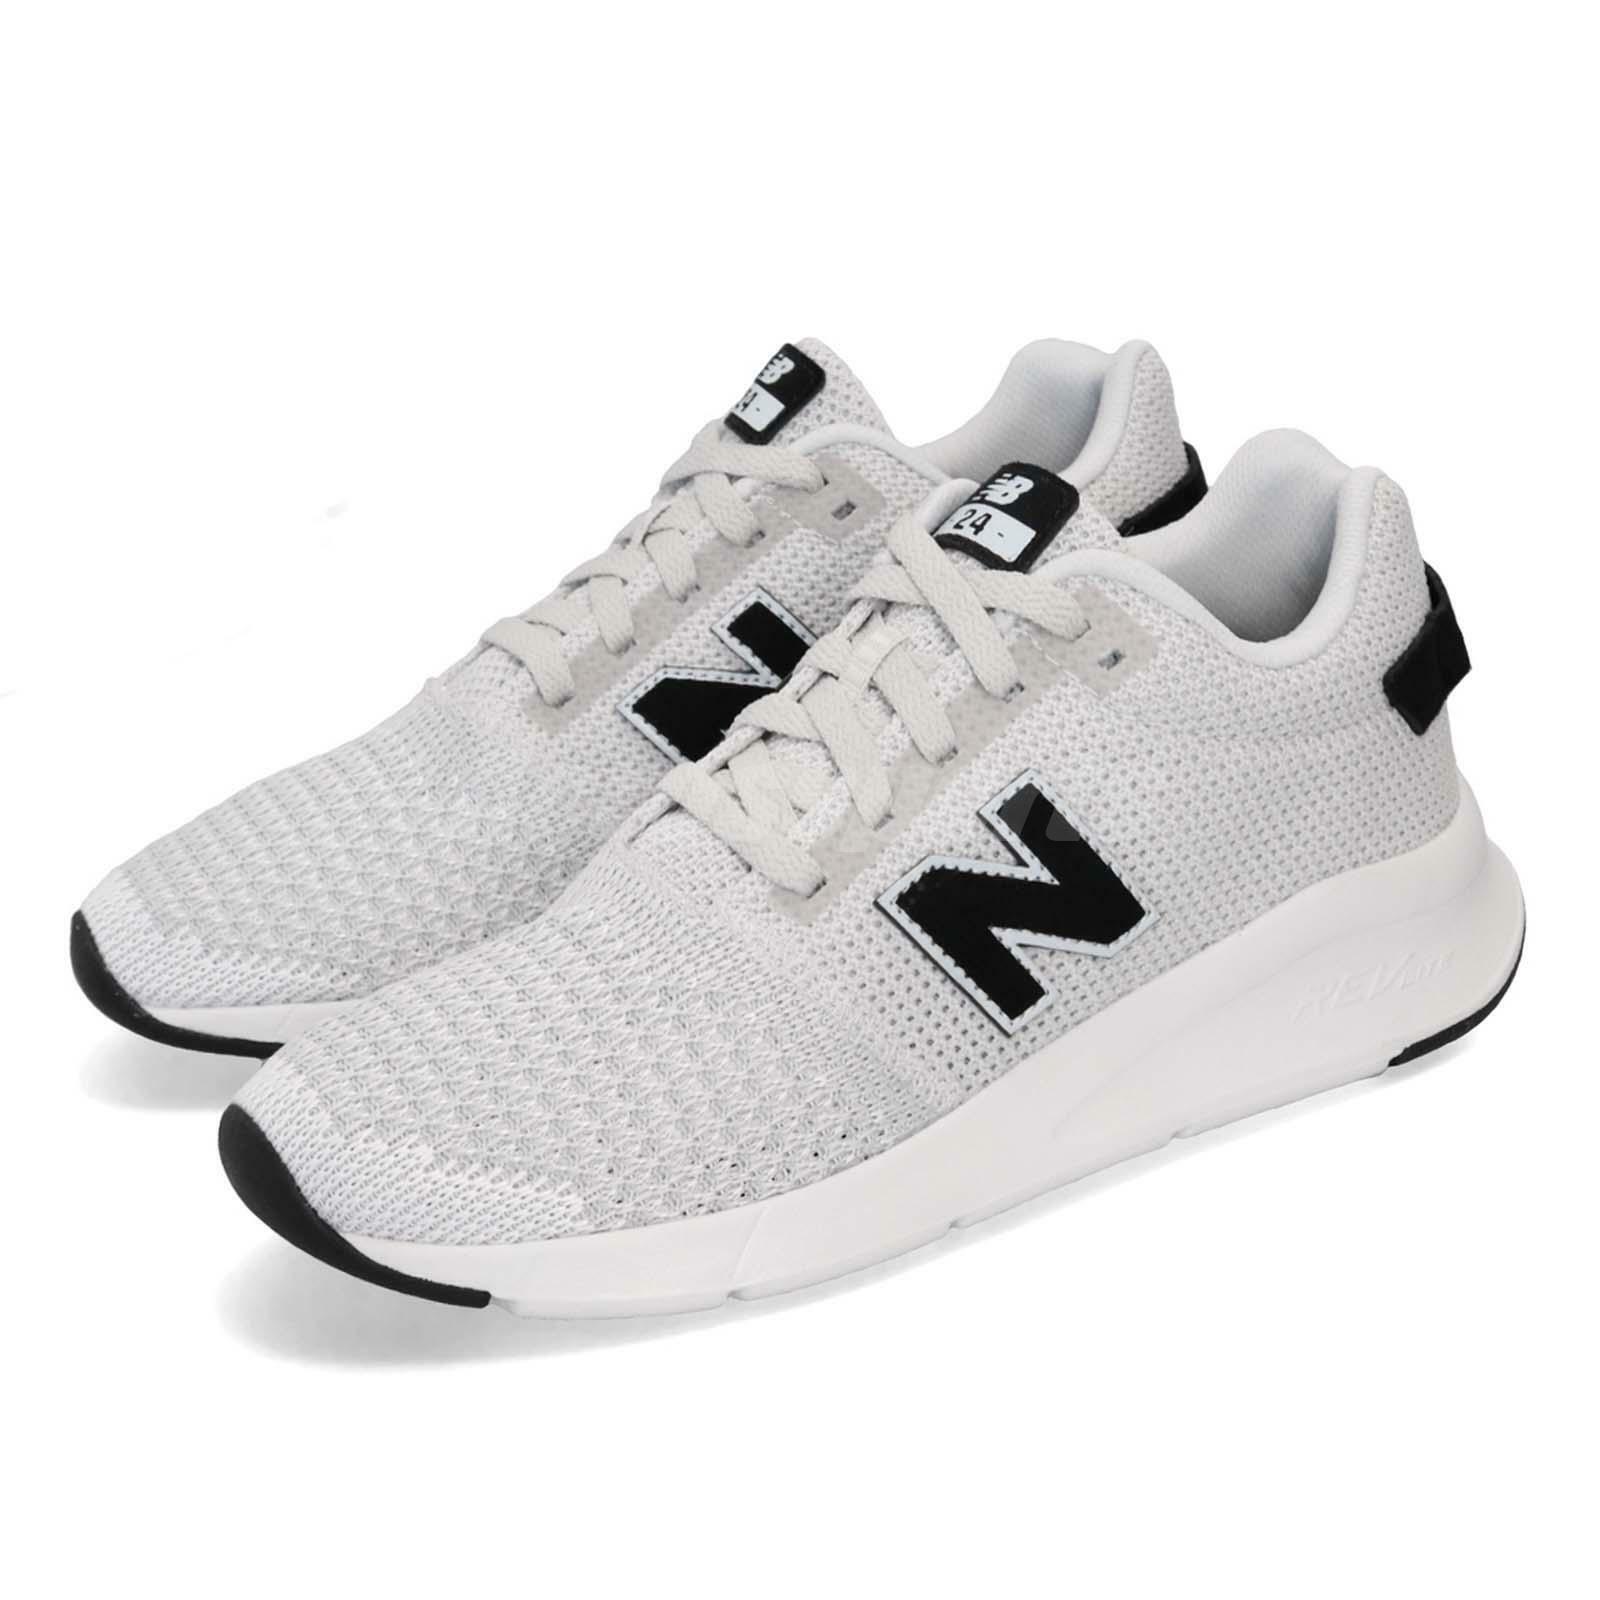 New Balance MS24DWG2 D gris negro blanco Men Running Casual zapatos MS24DWG2D